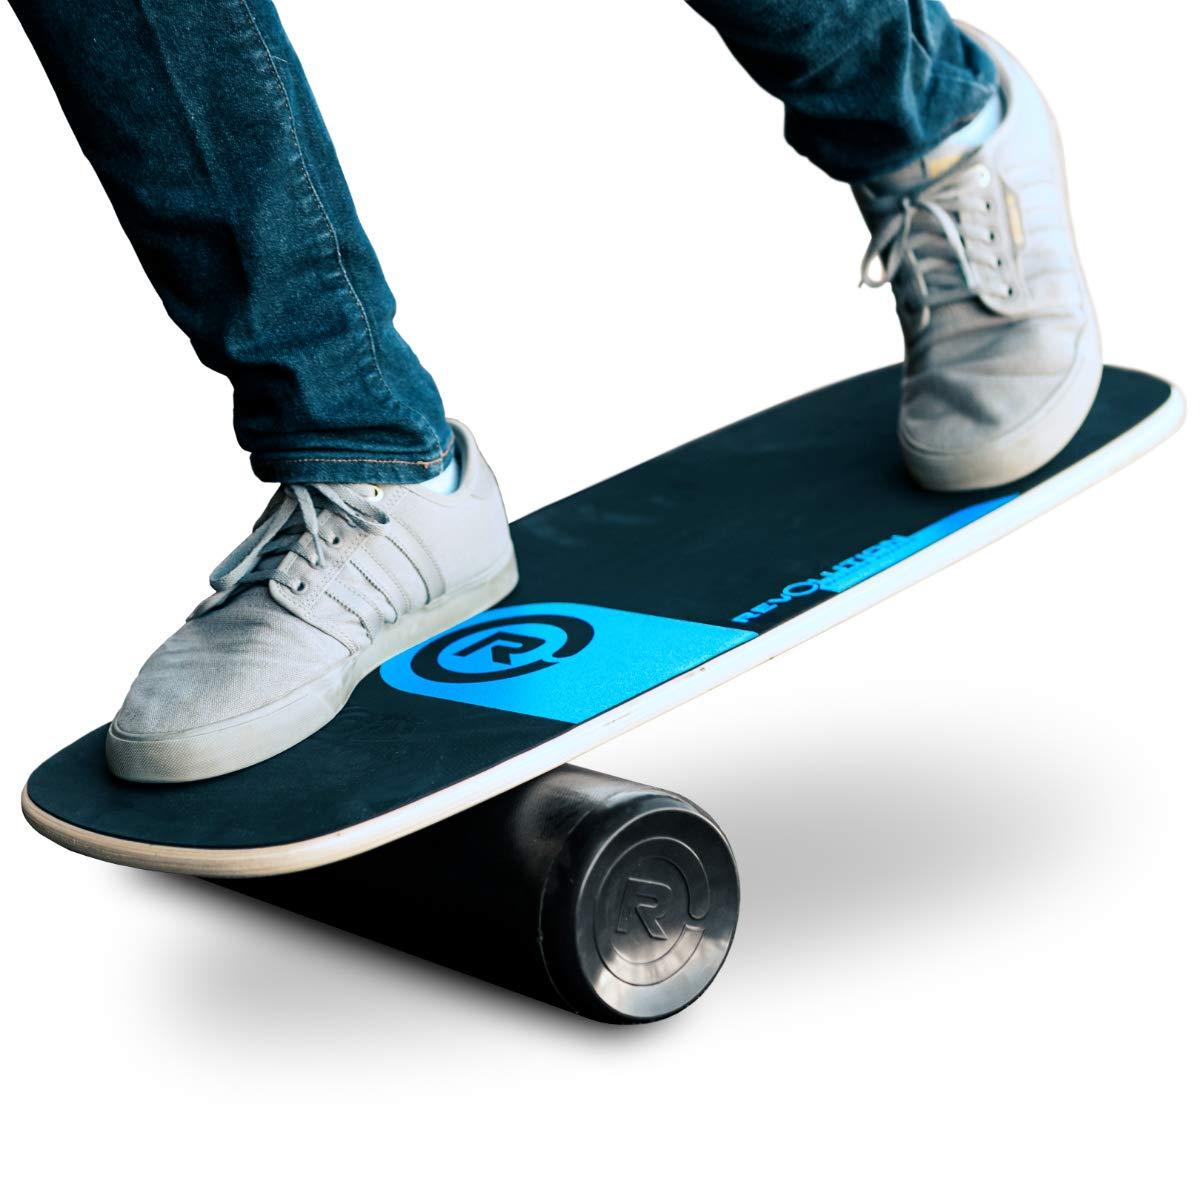 Revolution 101 Balance Board Trainer (Blue) by Revolution Balance Boards